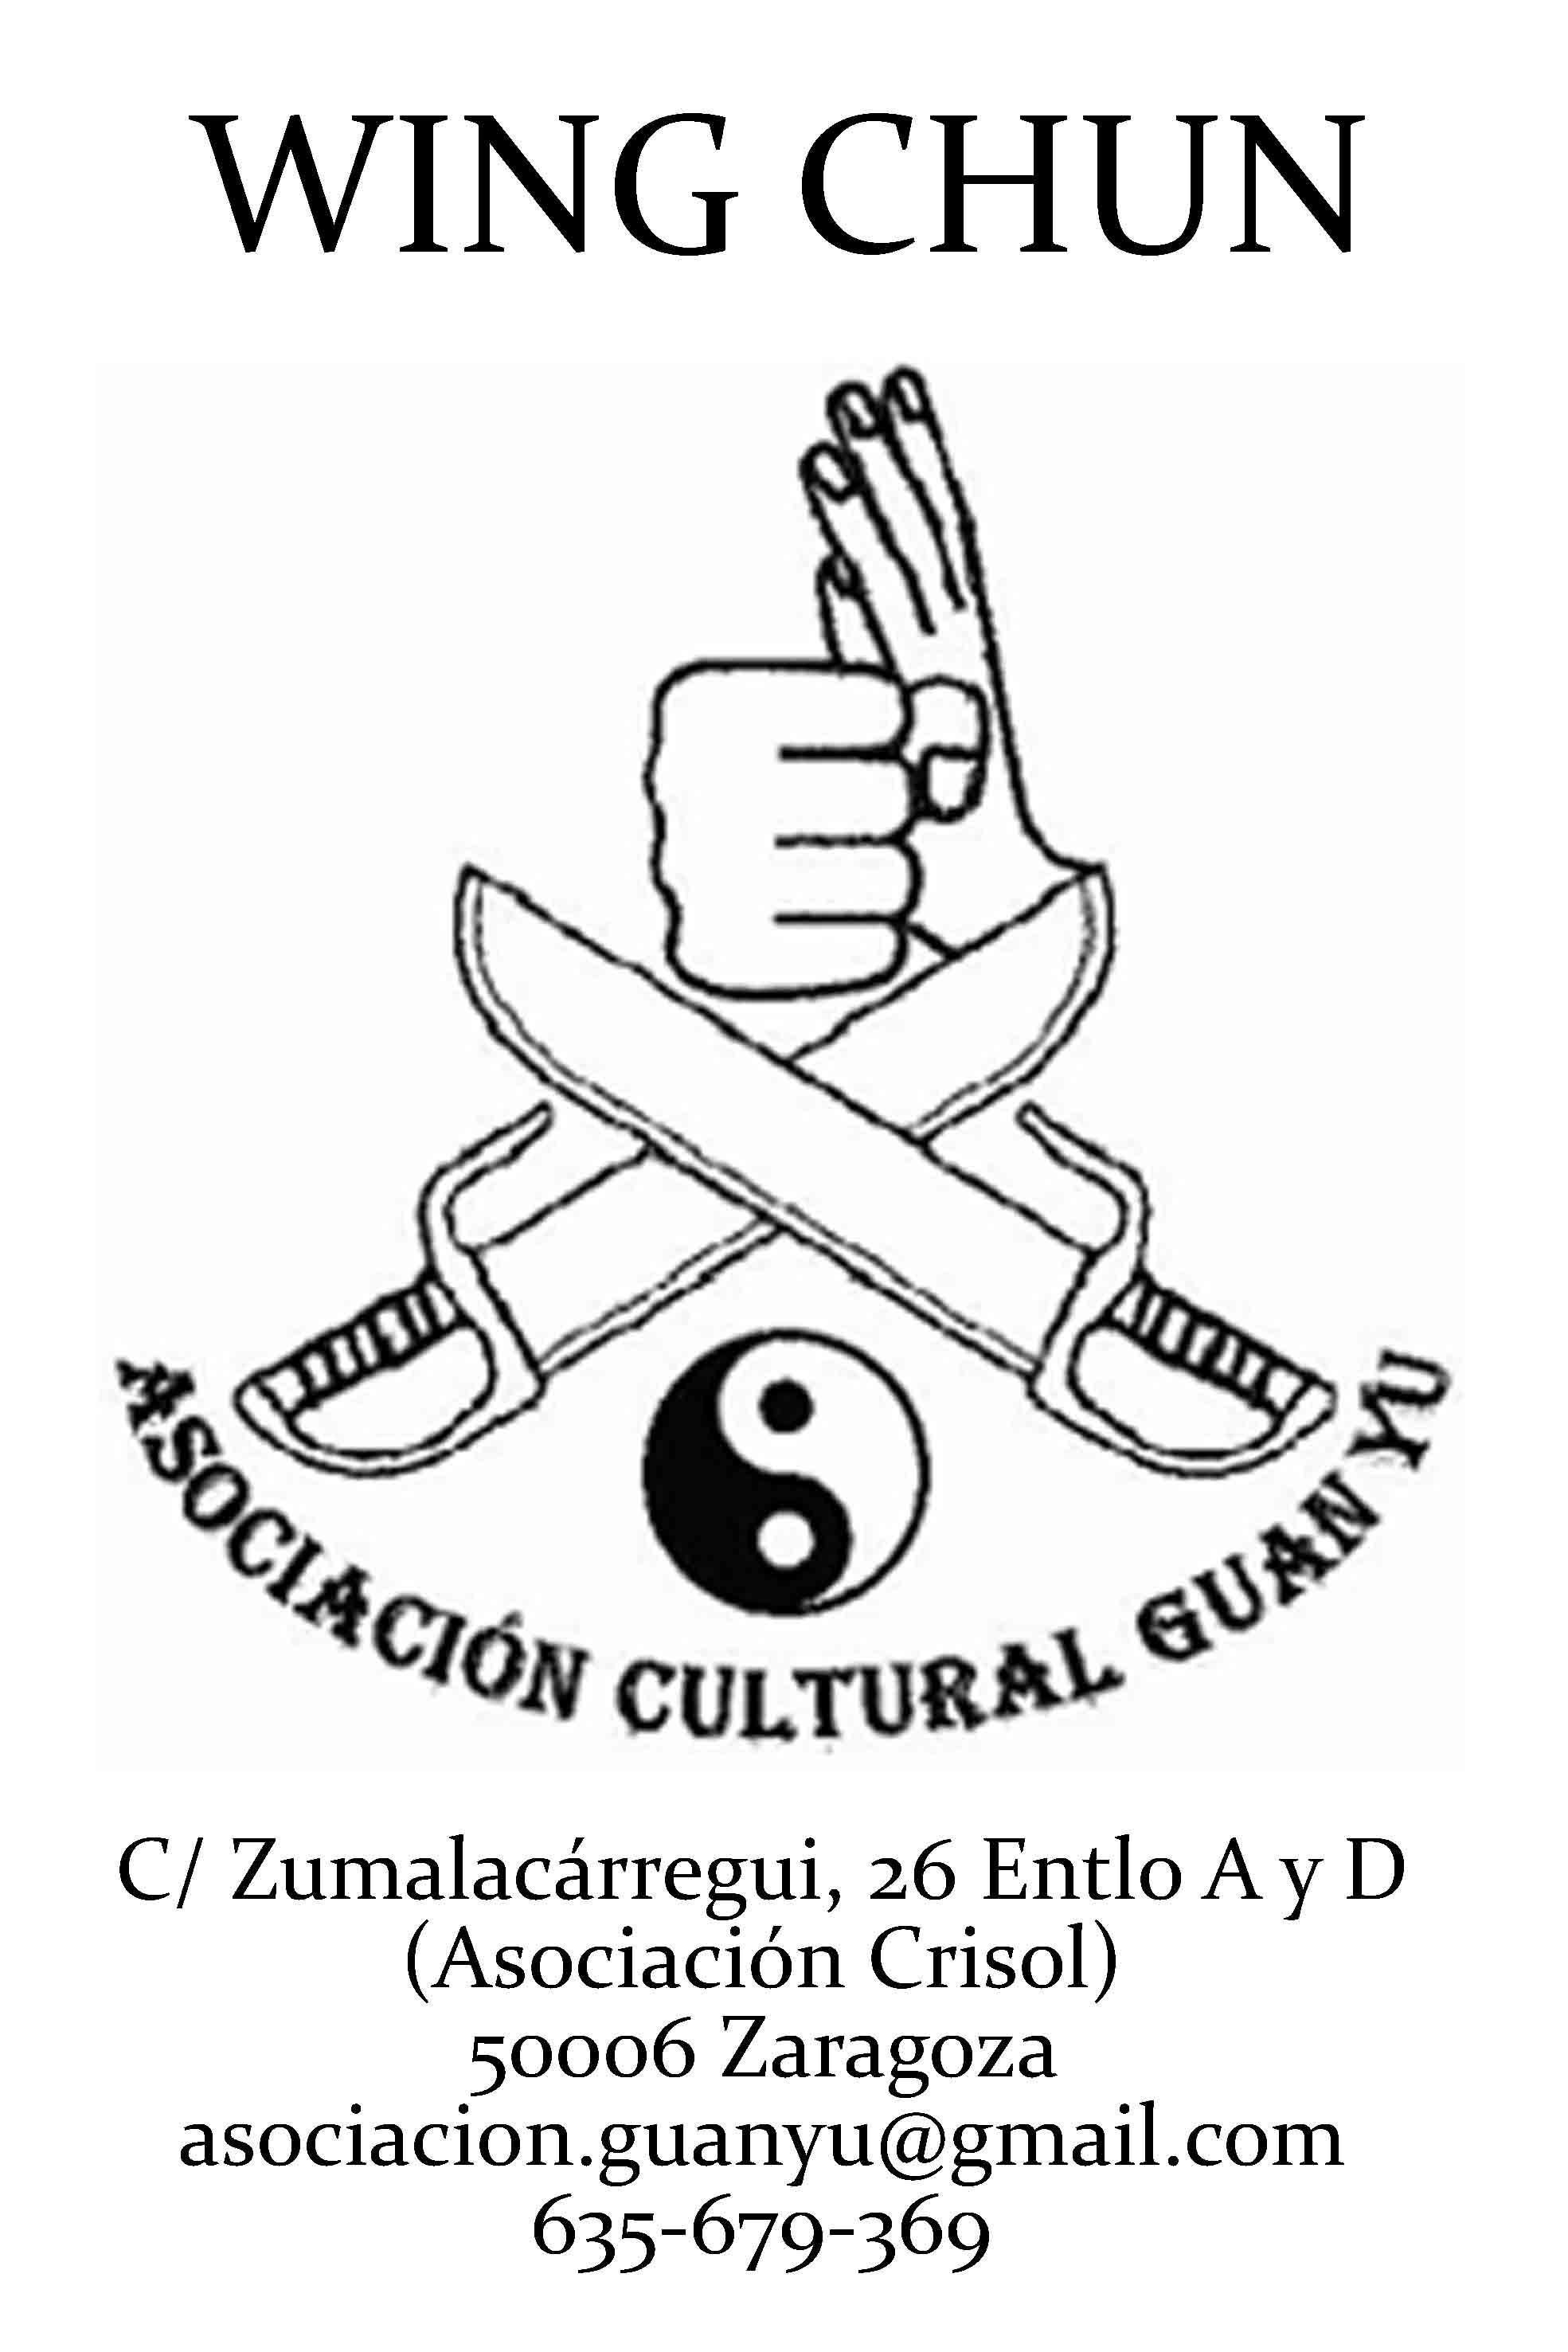 Asociación Guan Yu, Kung fu Wing Chun en Zaragoza